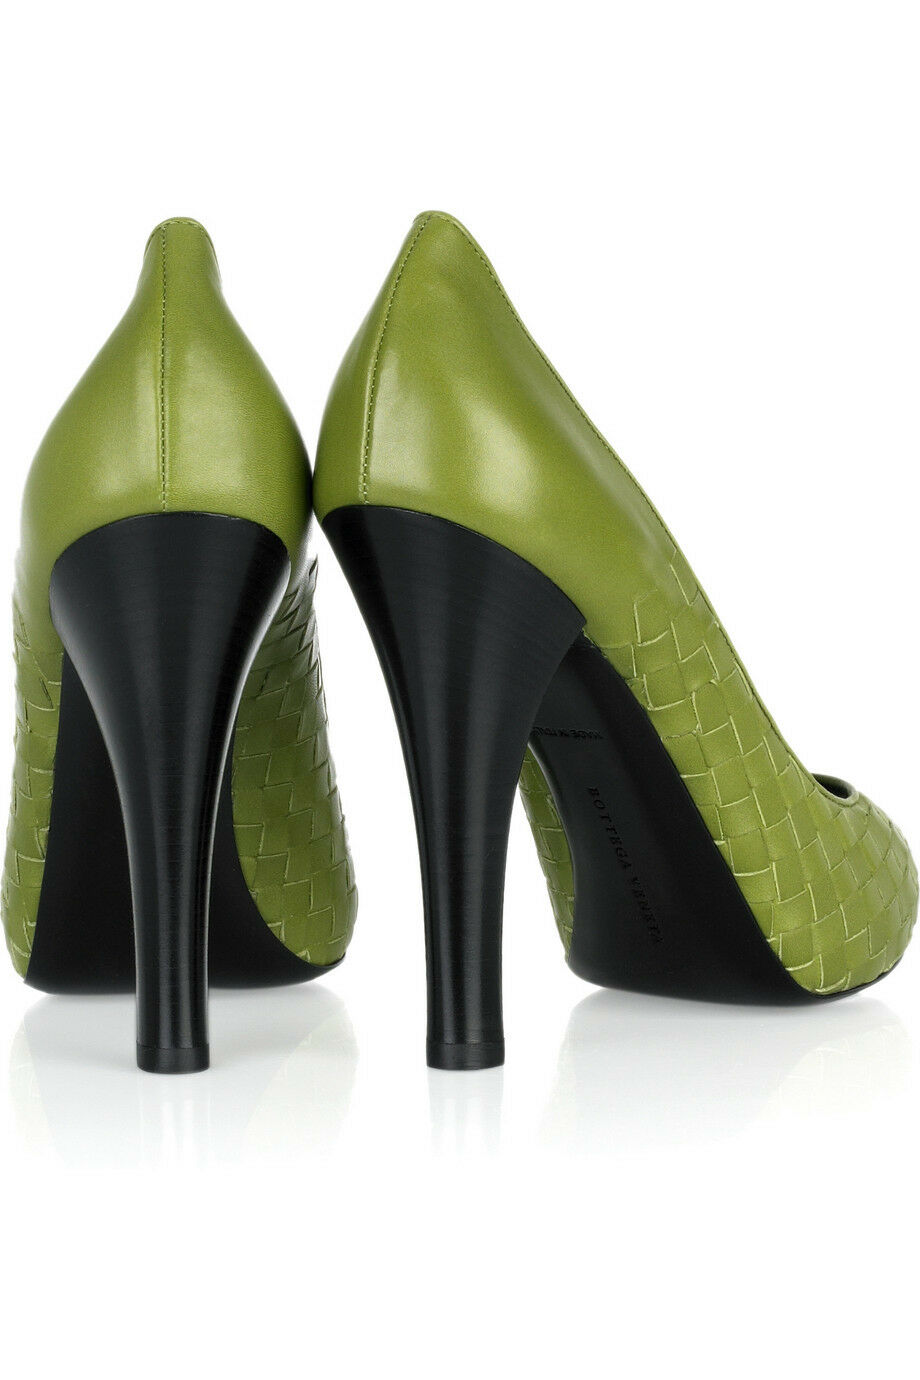 Bottega Veneta intrecciato Bout Ouvert Leaf Leaf Leaf vert Pump chaussures EU40.5 UK7.5 US10.5 Neuf dans sa boîte b327bc